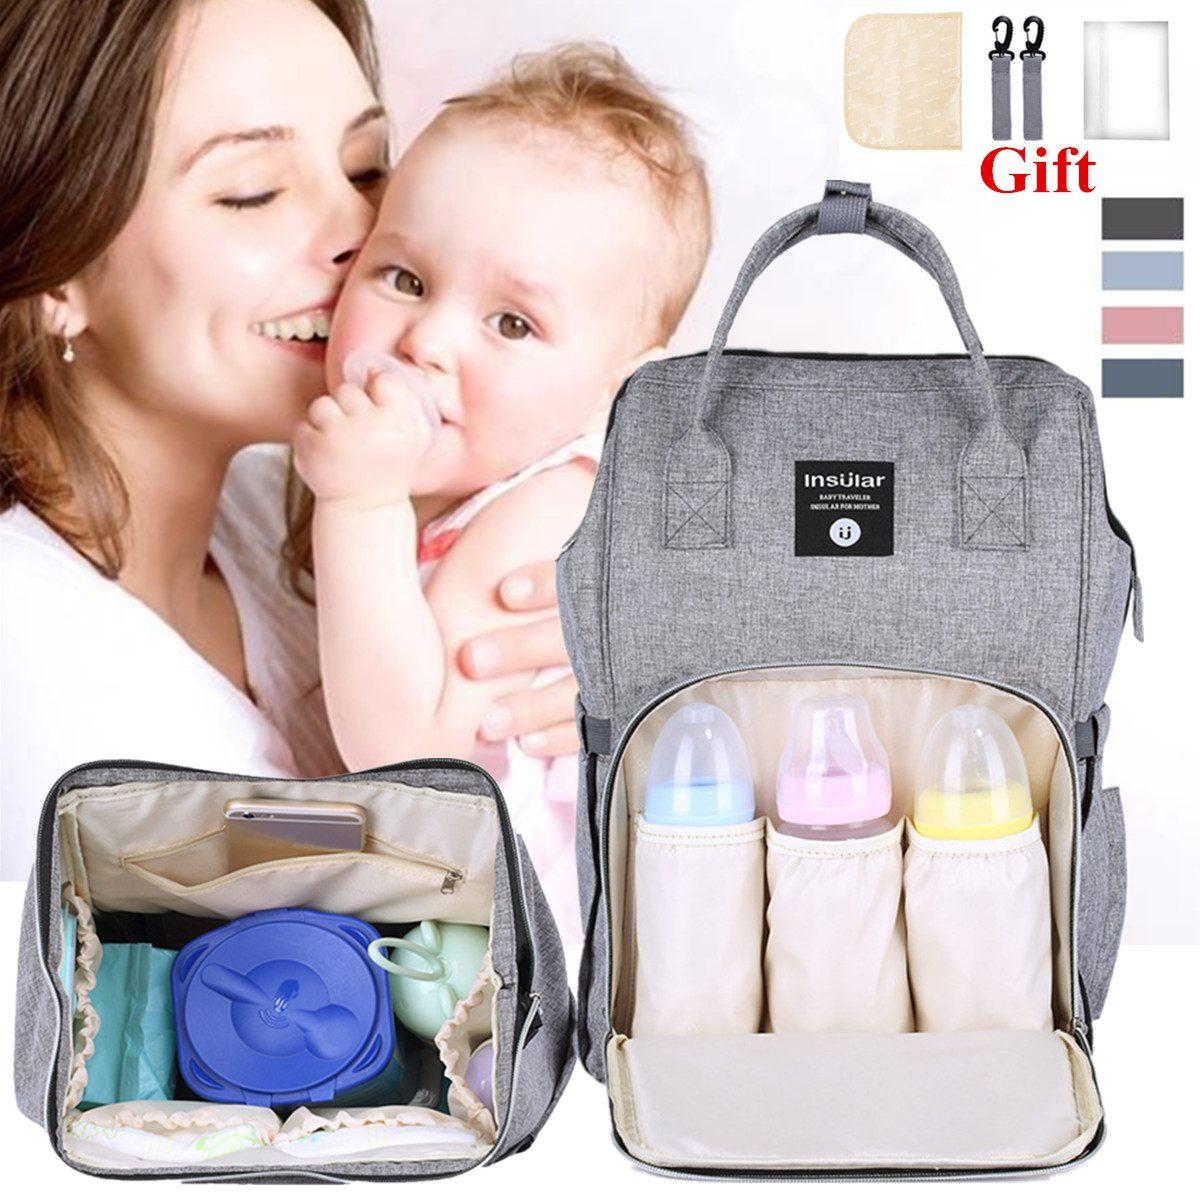 Nappy Backpack Bag Mummy Large Capacity Stroller Bag Mom Baby Multi-function Waterproof Outdoor Travel Diaper Bags Nursing Bag